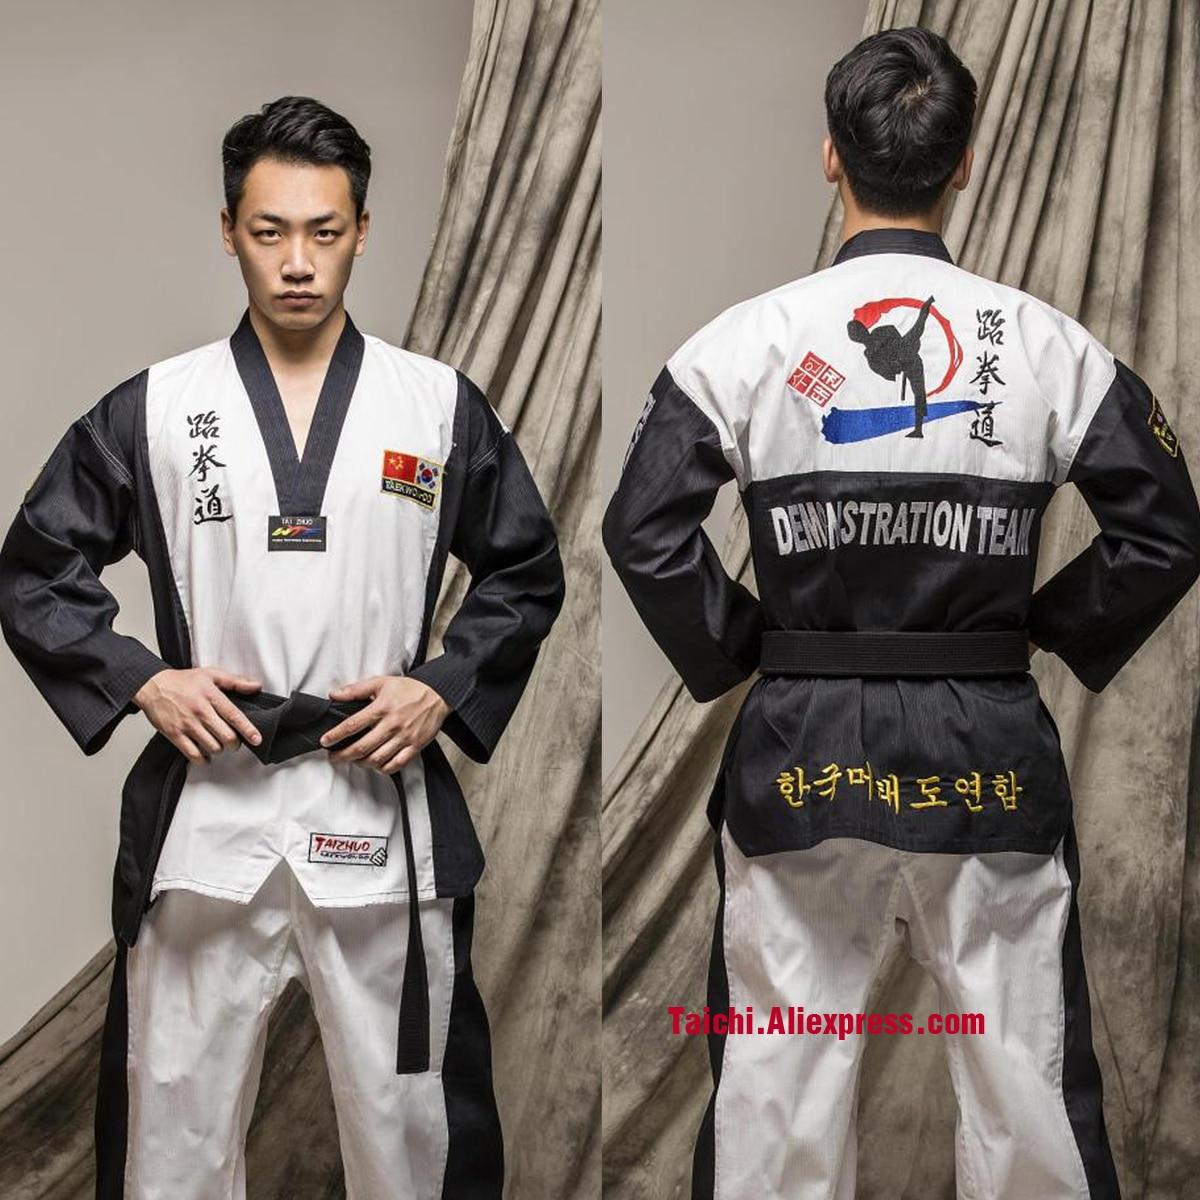 Martial Arts TKD Tae Kwon Do Korea V-neck   Taekwondo Dobok For Poomsae & Training,WTF Uniform,160-190cm Black And Blue